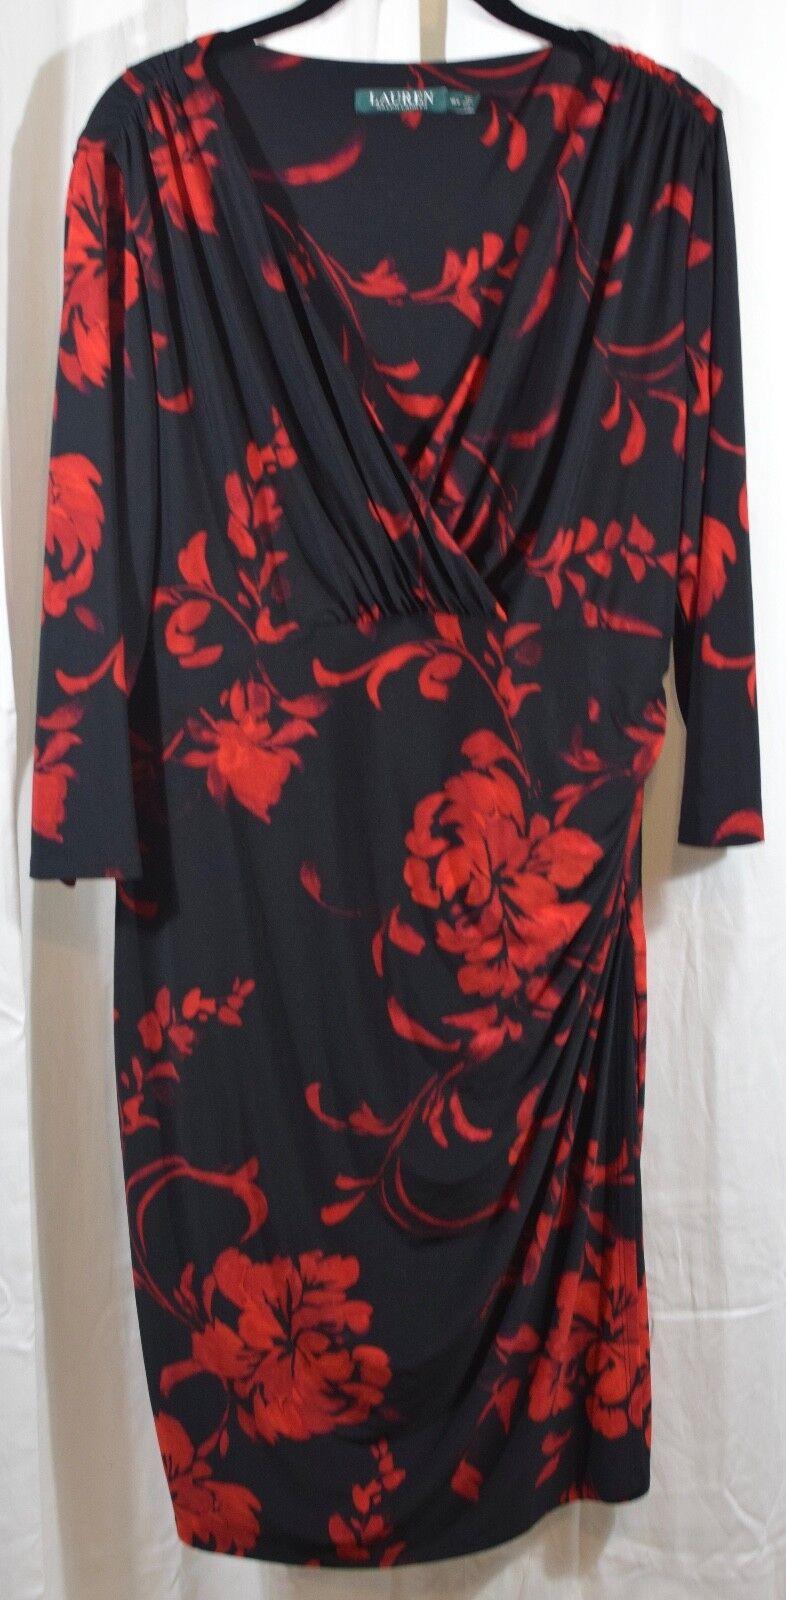 Lauren Ralph Lauren Floral Printed Jersey Dress Size 16W